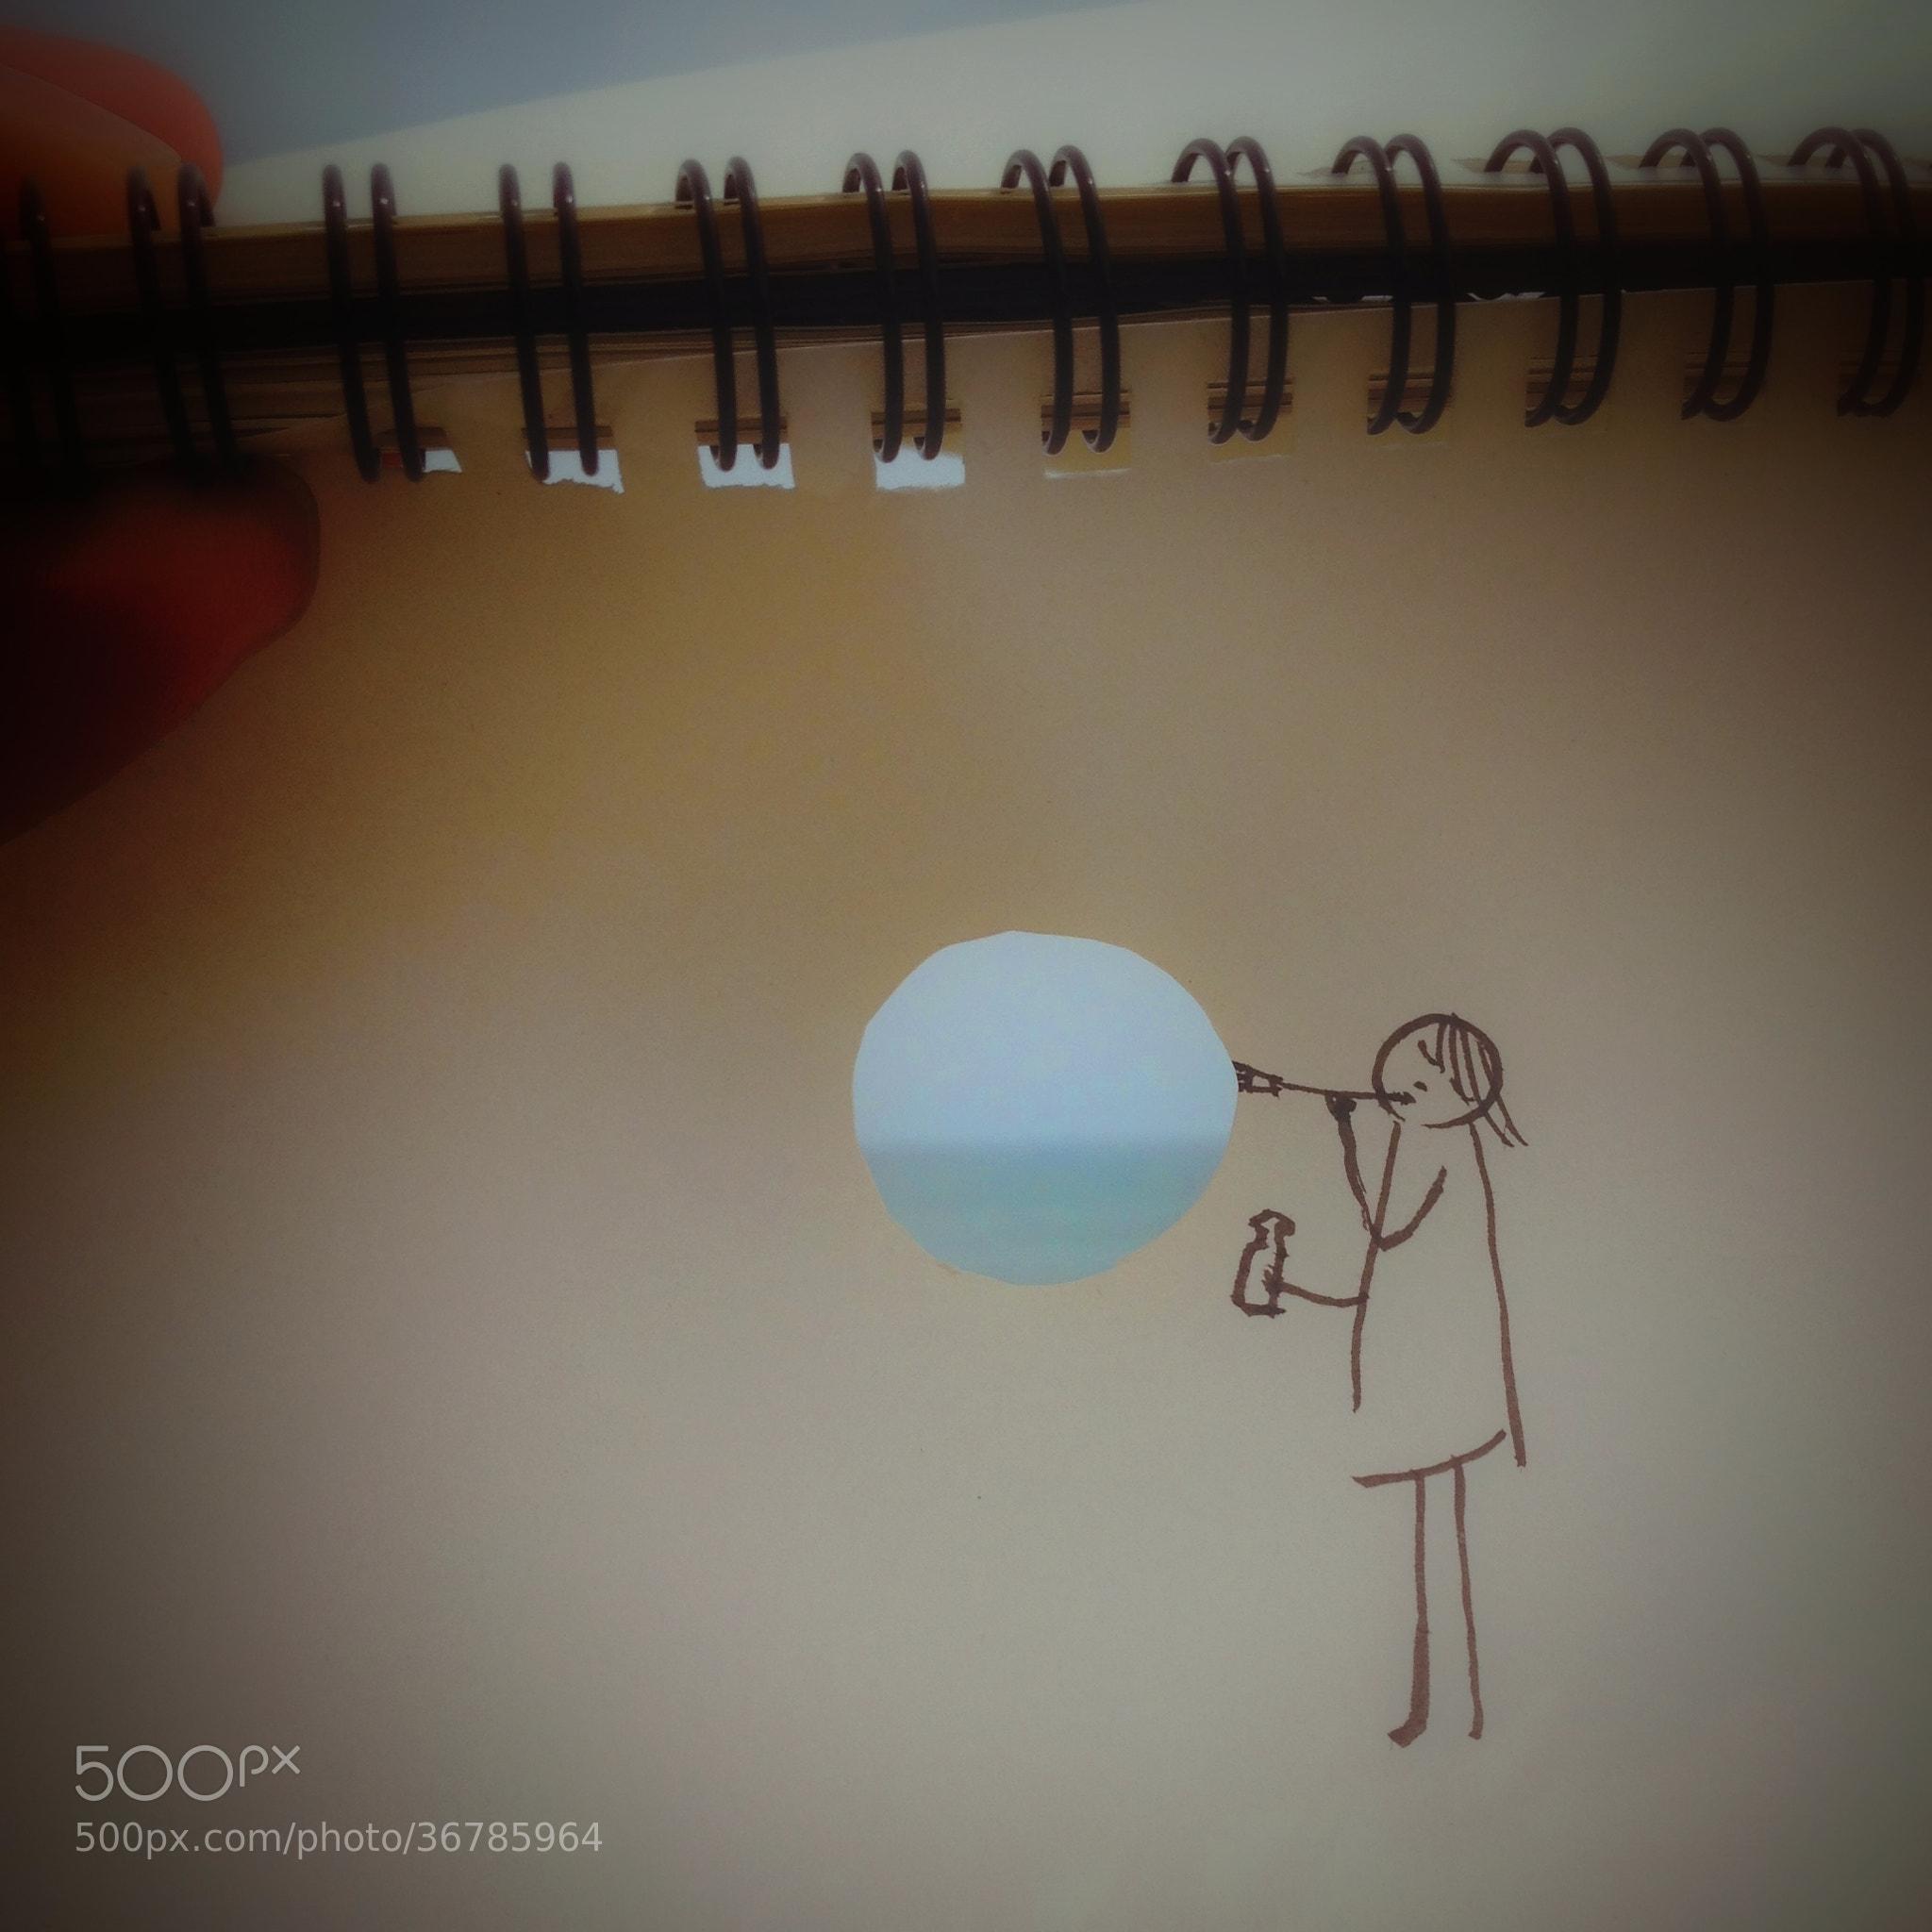 Photograph Like soap bubbles by Kouichi Chiba on 500px